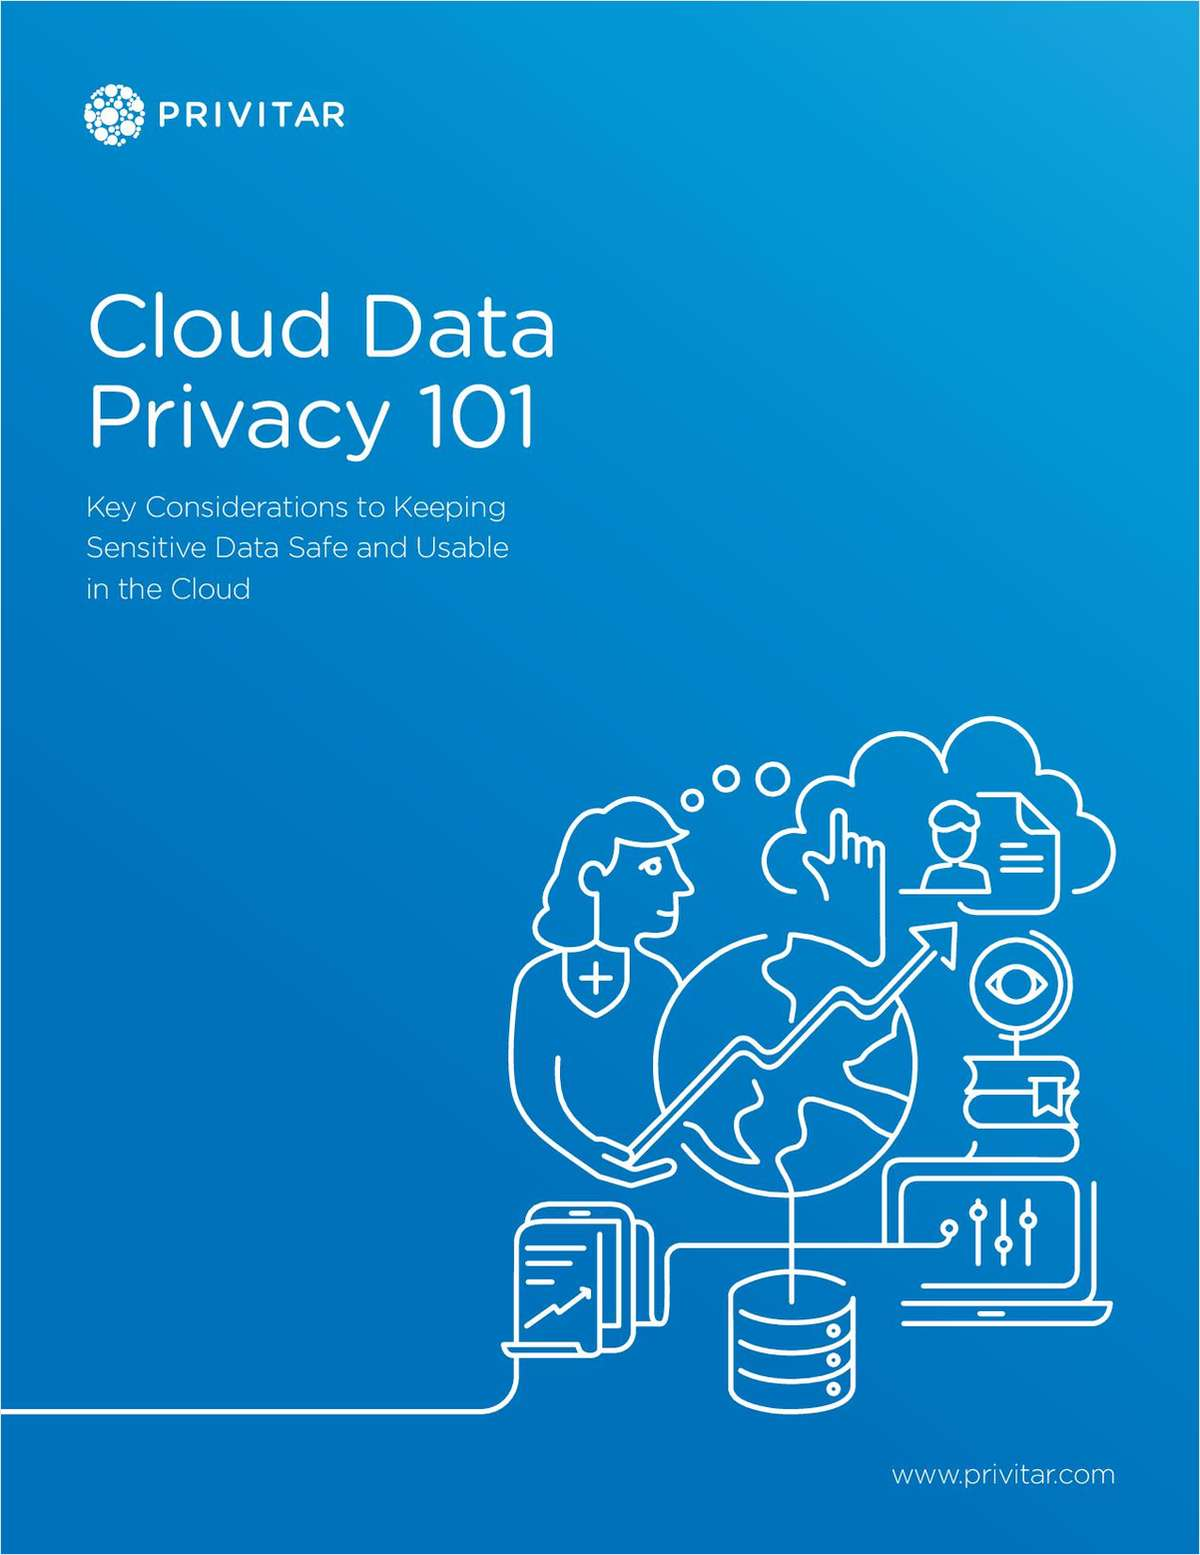 Cloud Data Privacy 101